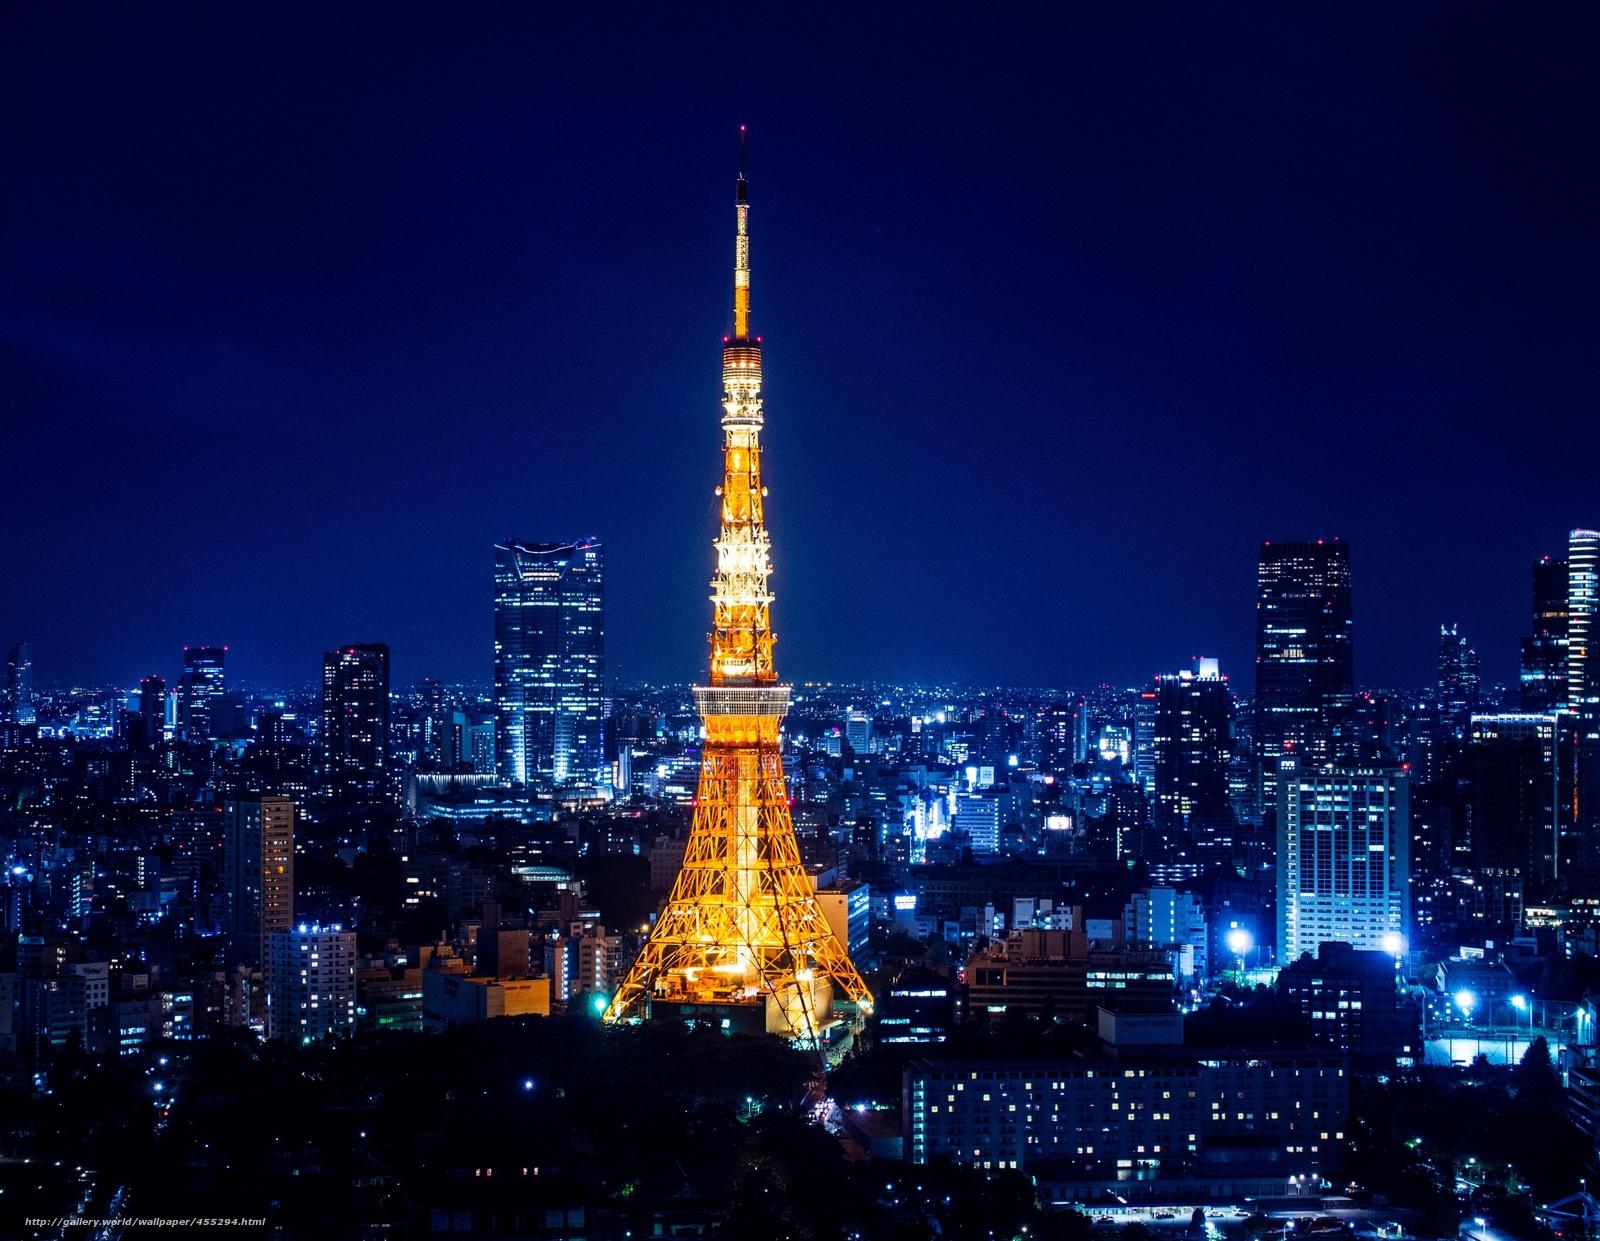 Wallpaper download paris - Download Wallpaper City Eifel Paris Tower Free Desktop Wallpaper In